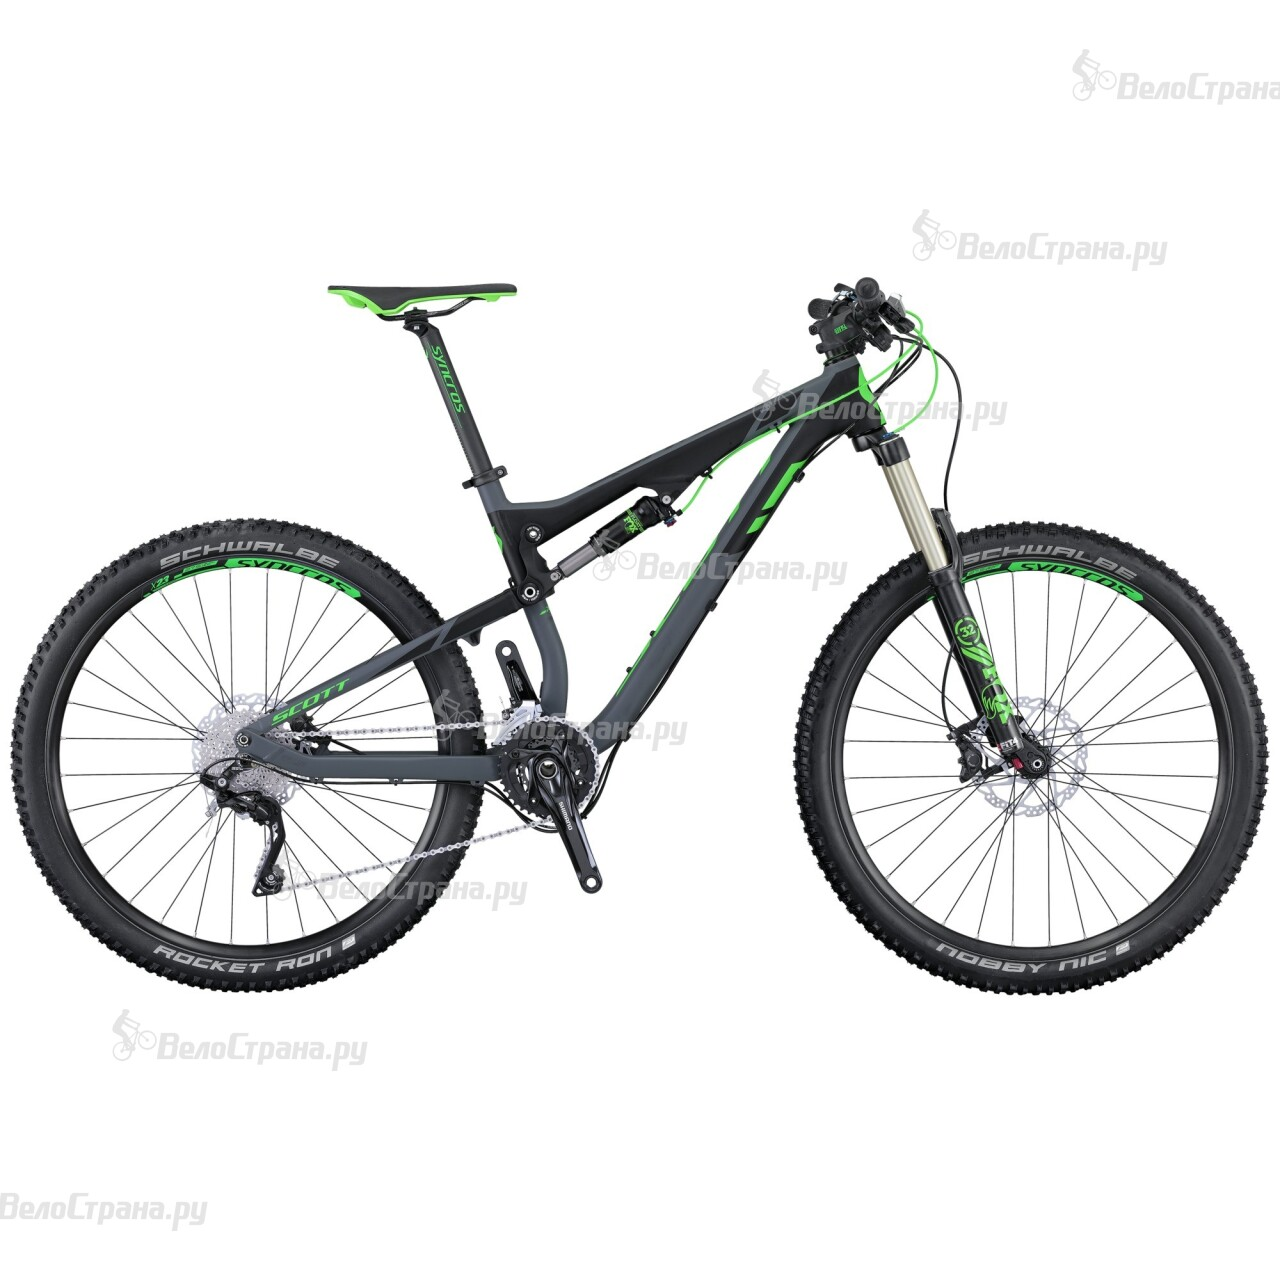 Велосипед Scott Genius 940 (2016)